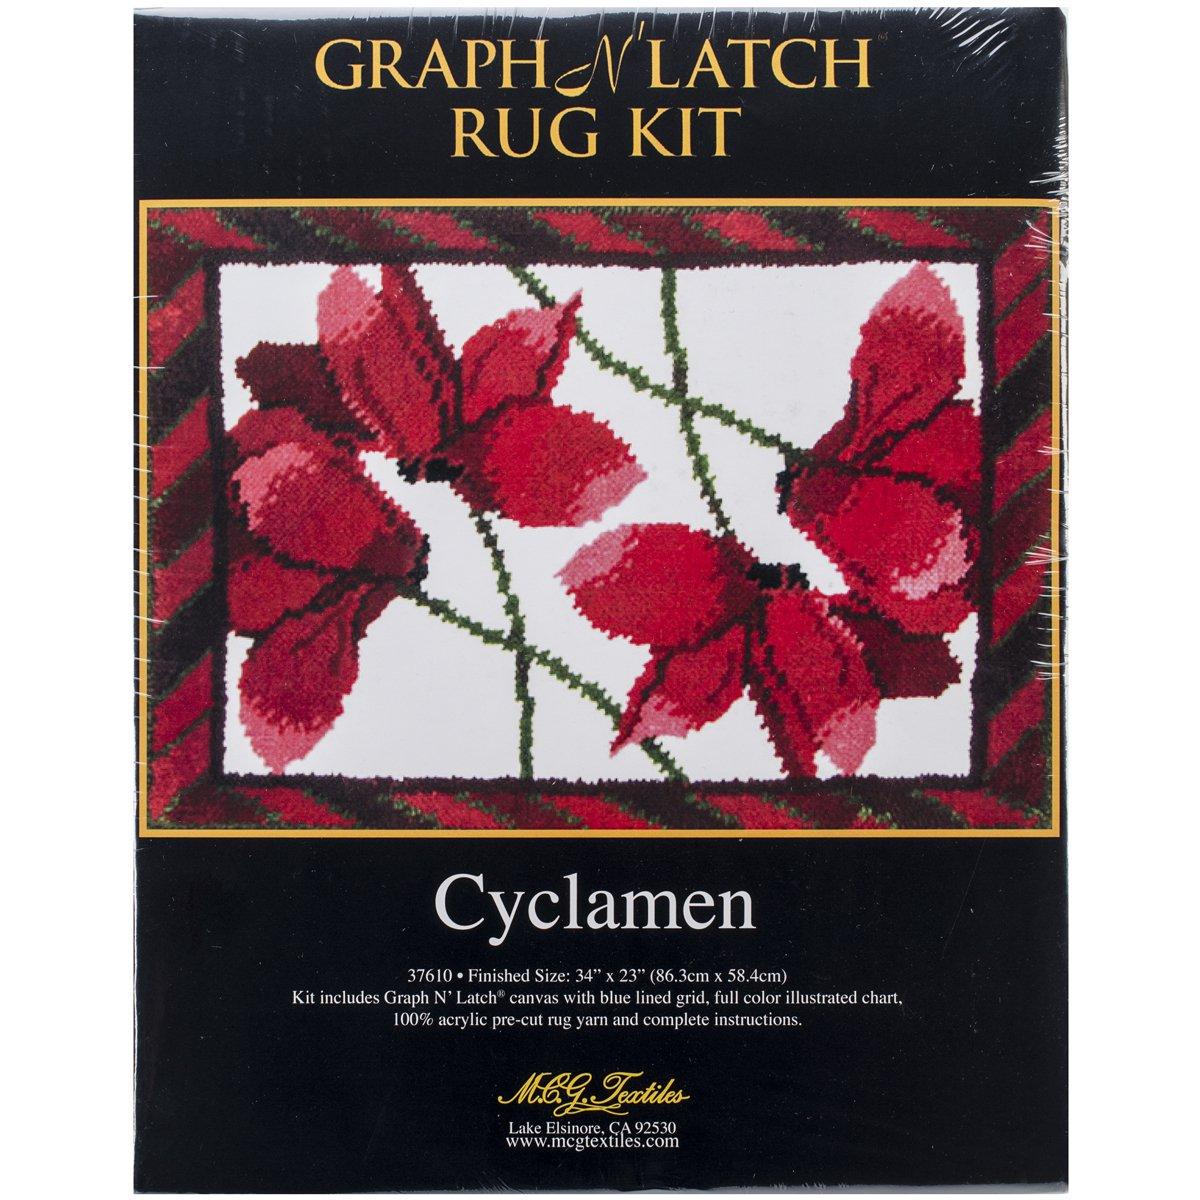 MCG Textiles 37610 Cyclamen Latch Hook Rug Kit